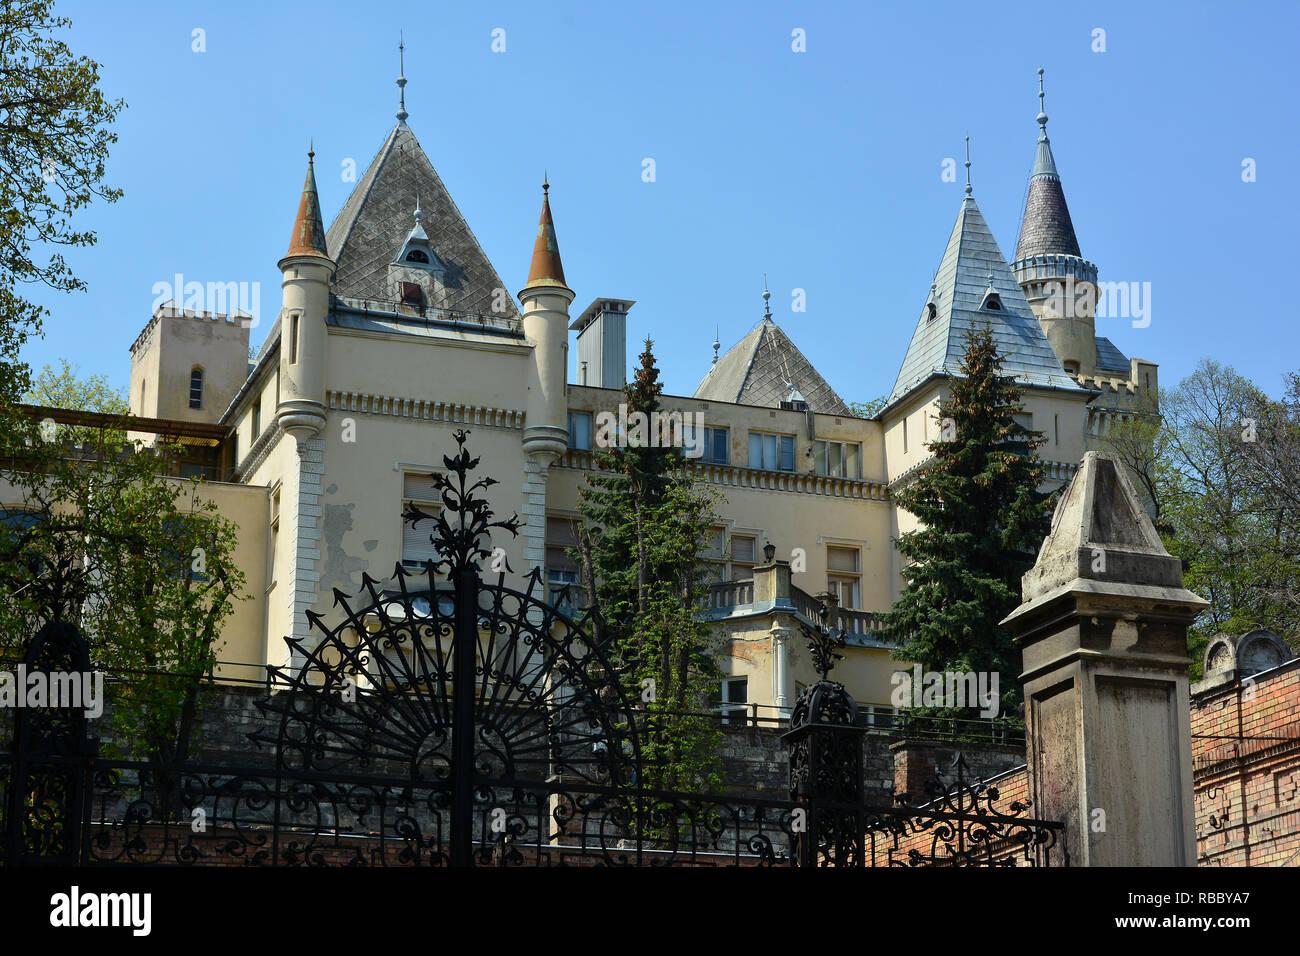 The Törley Castle in Budafok, Budapest XXII. district., A Törley-kastély Budafokon, Budapest XXII. kerületében. - Stock Image